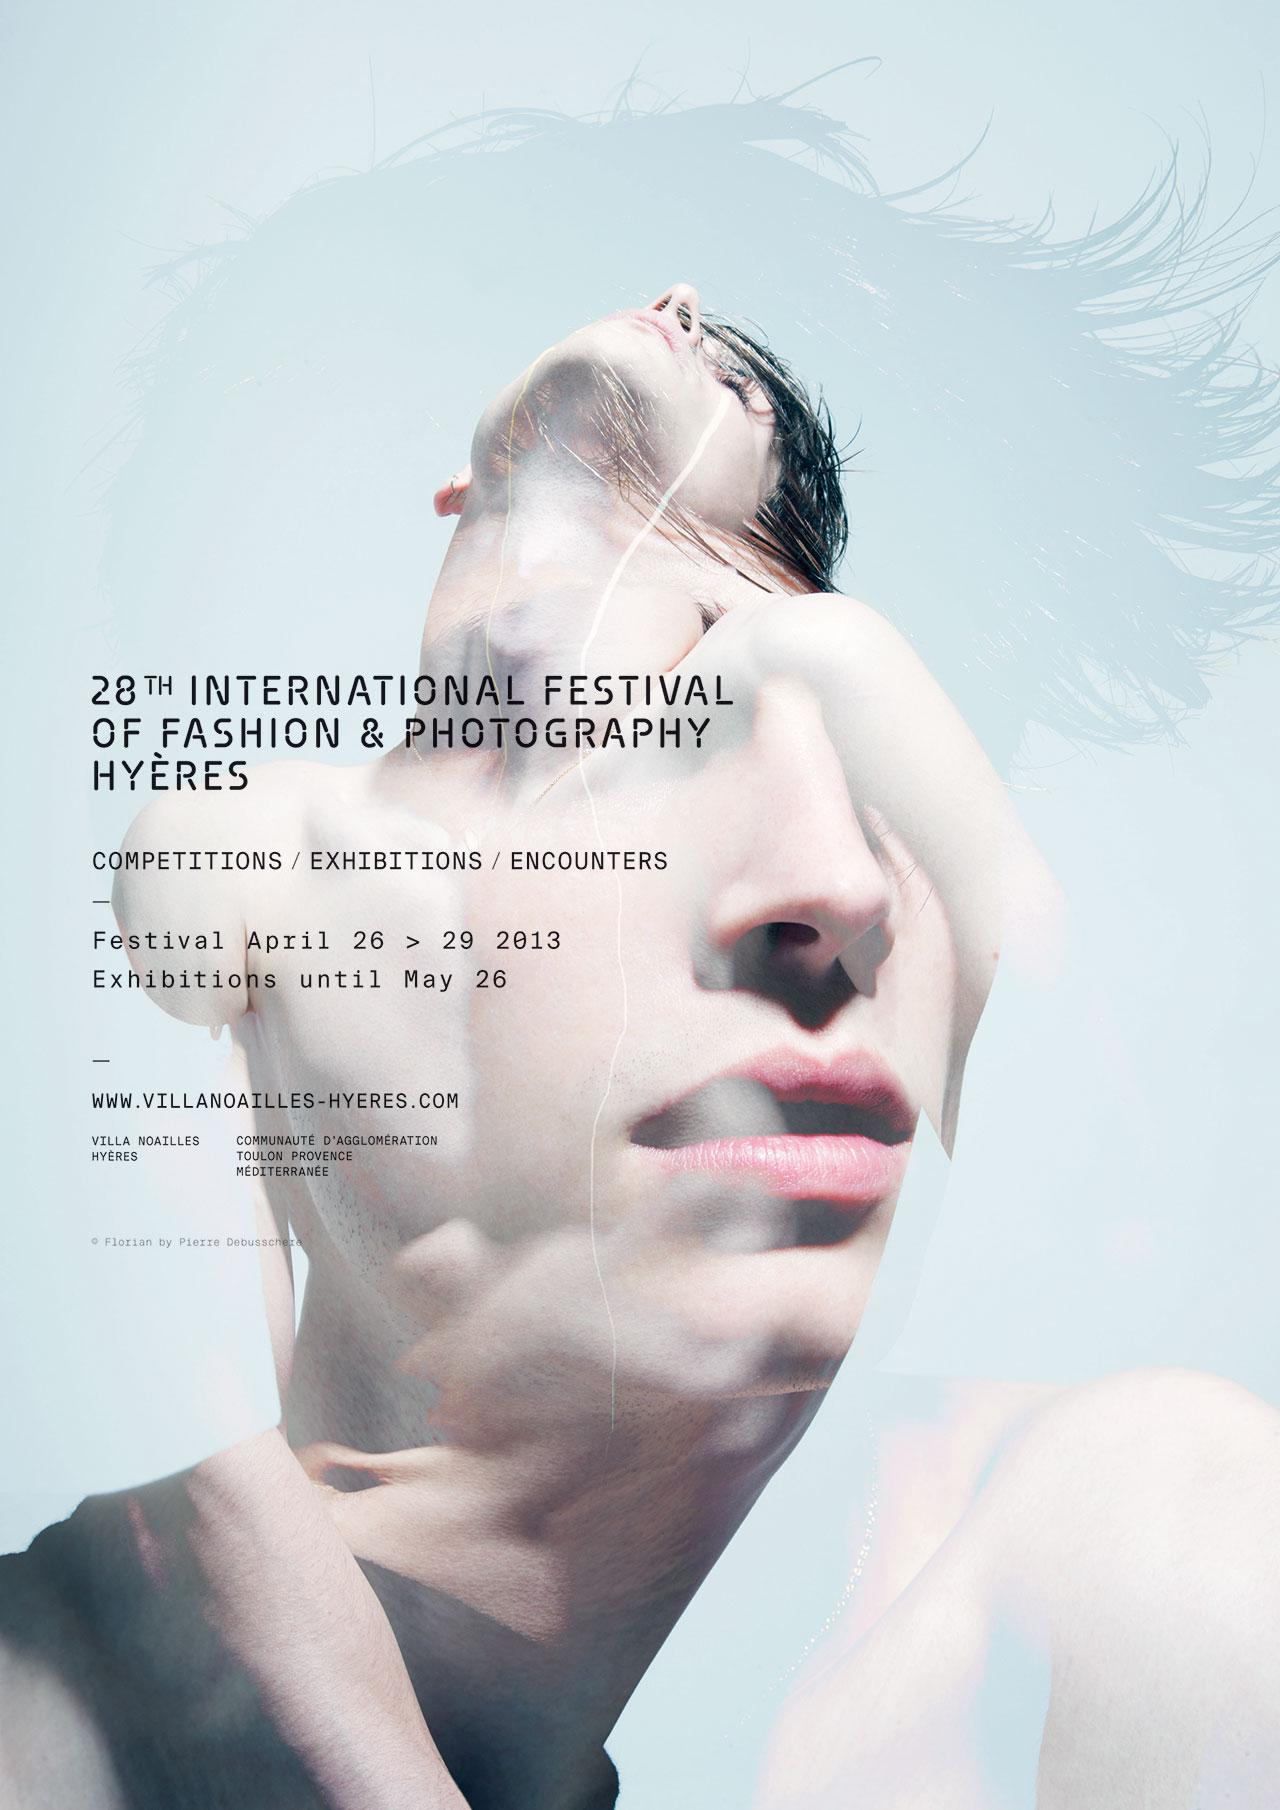 The poster of HYÈRES 2013, Florian © Pierre Debusschere.